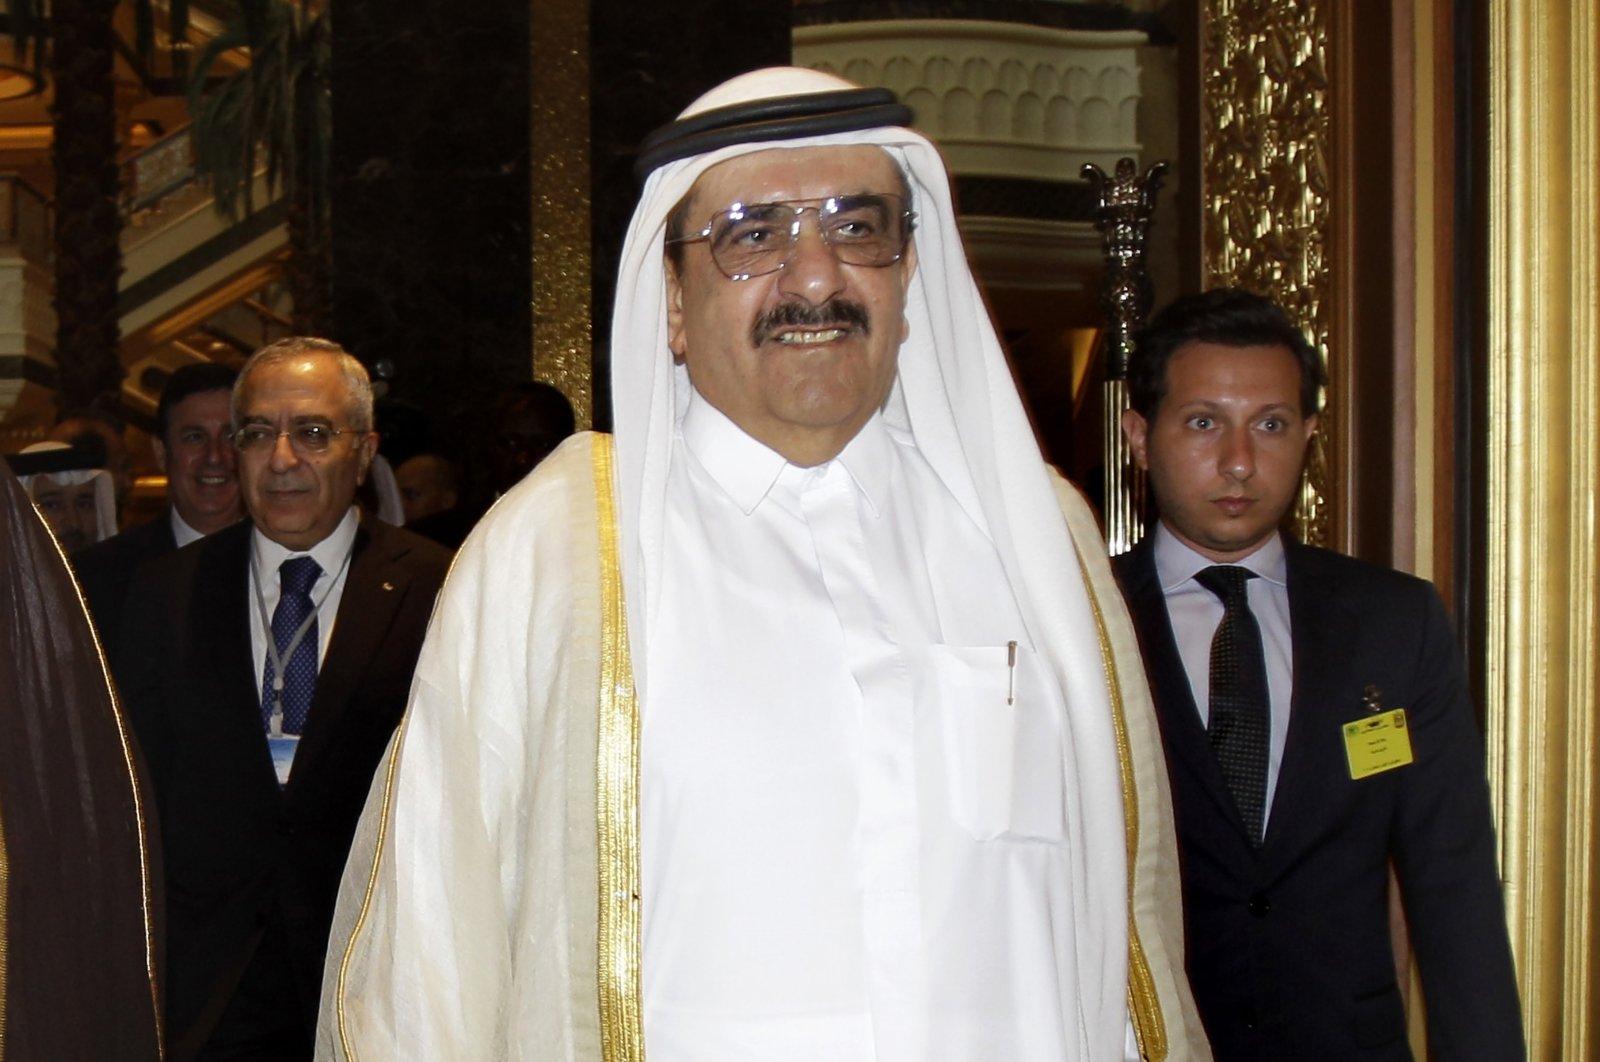 Sheikh Hamdan bin Rashid Al Maktoum, deputy ruler of Dubai and the United Arab Emirates minister of finance, attends the opening of the Arab Finance Ministers Exceptional meeting in Abu Dhabi, UAE, Sept. 7, 2011. (AP Photo)